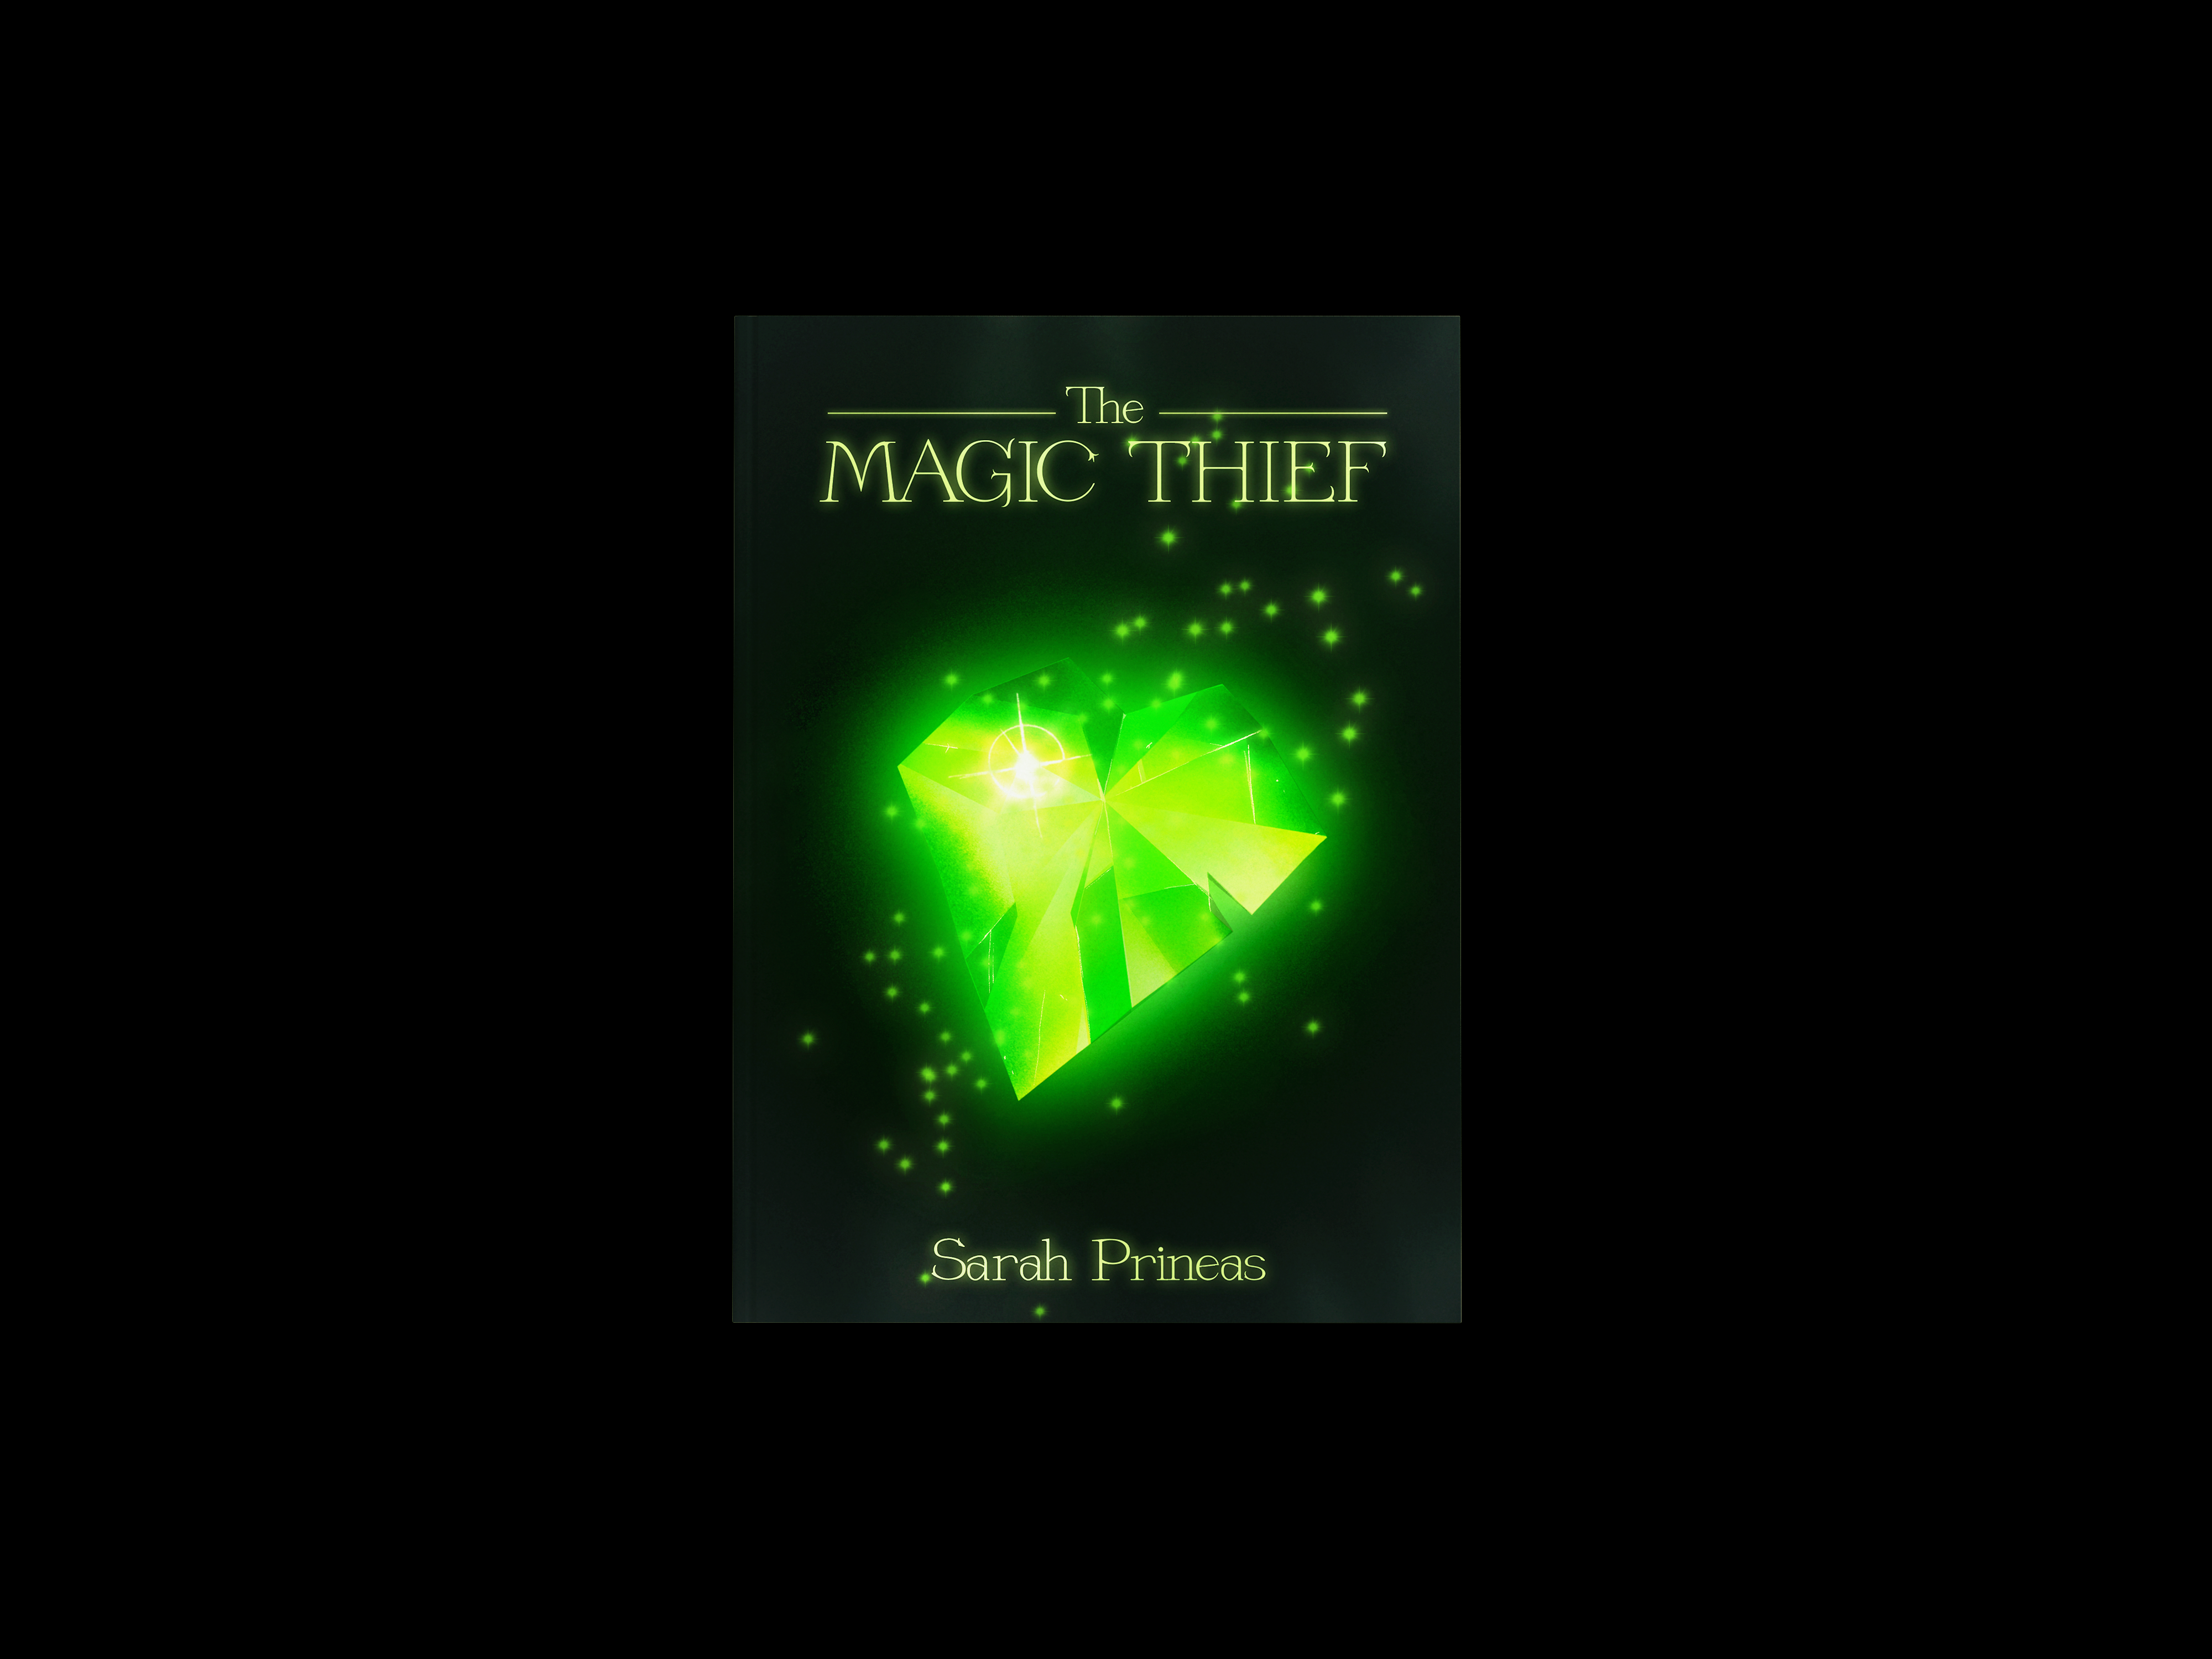 The Magic Thief Book Cover